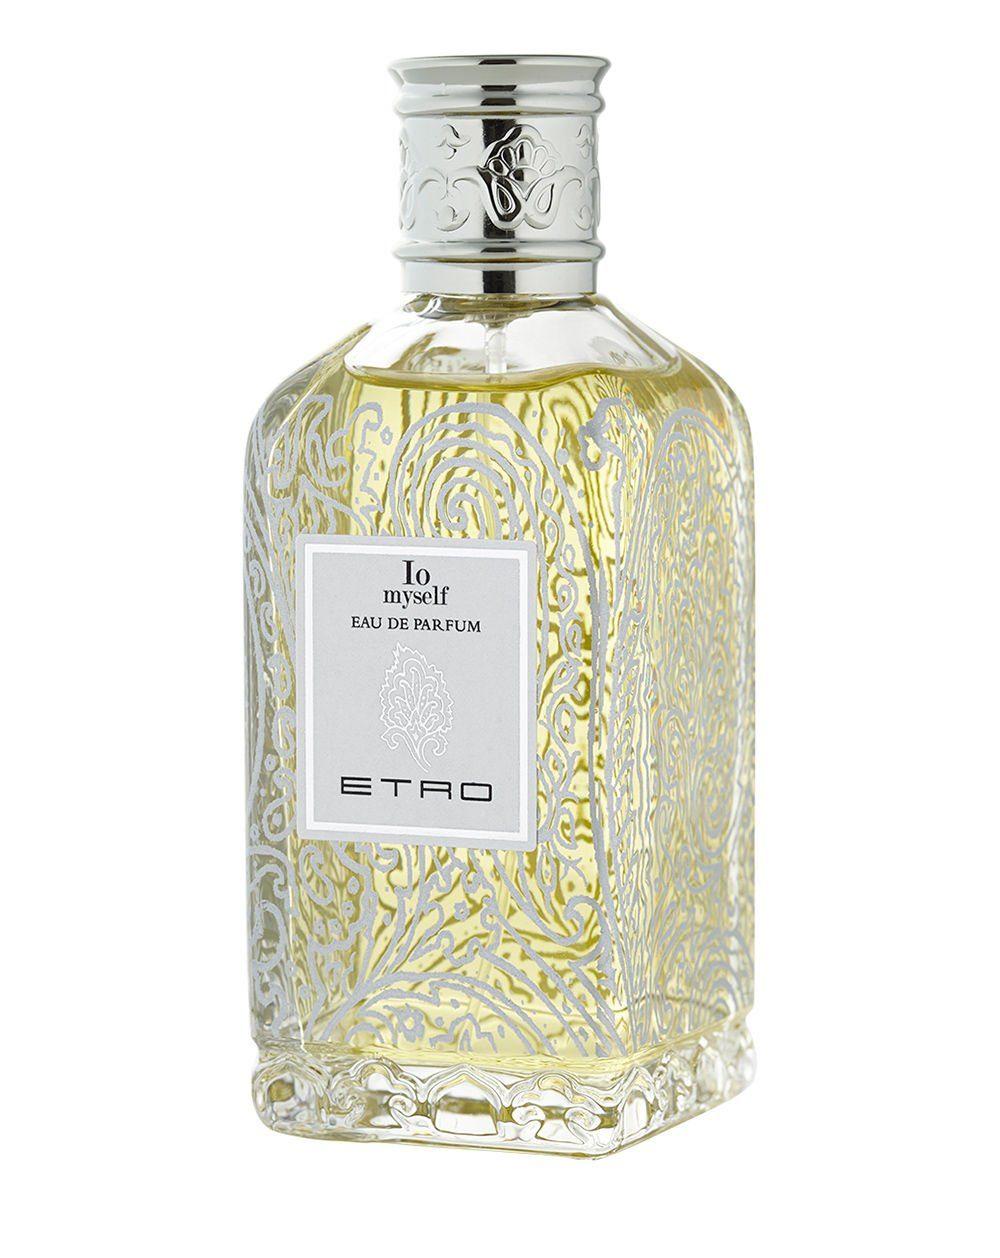 Etro Eau de Parfum »Io Myself«